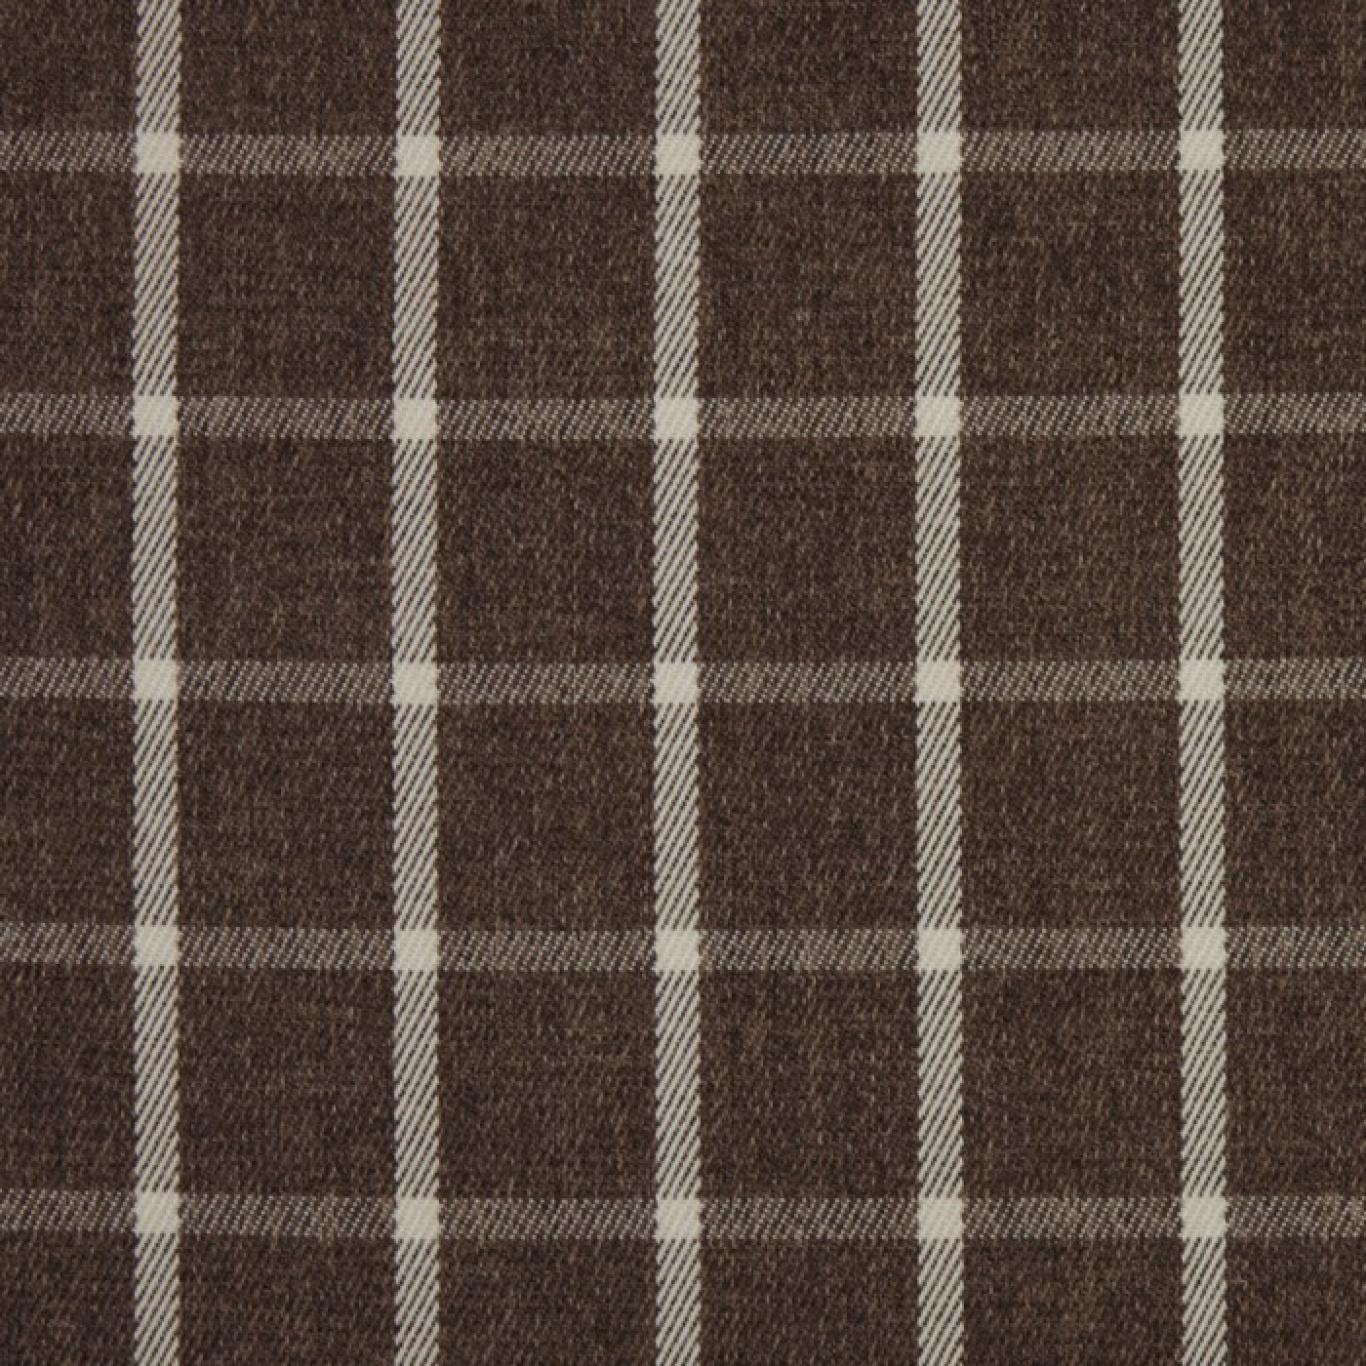 Image of Prestigious Halkirk Bracken Fabric